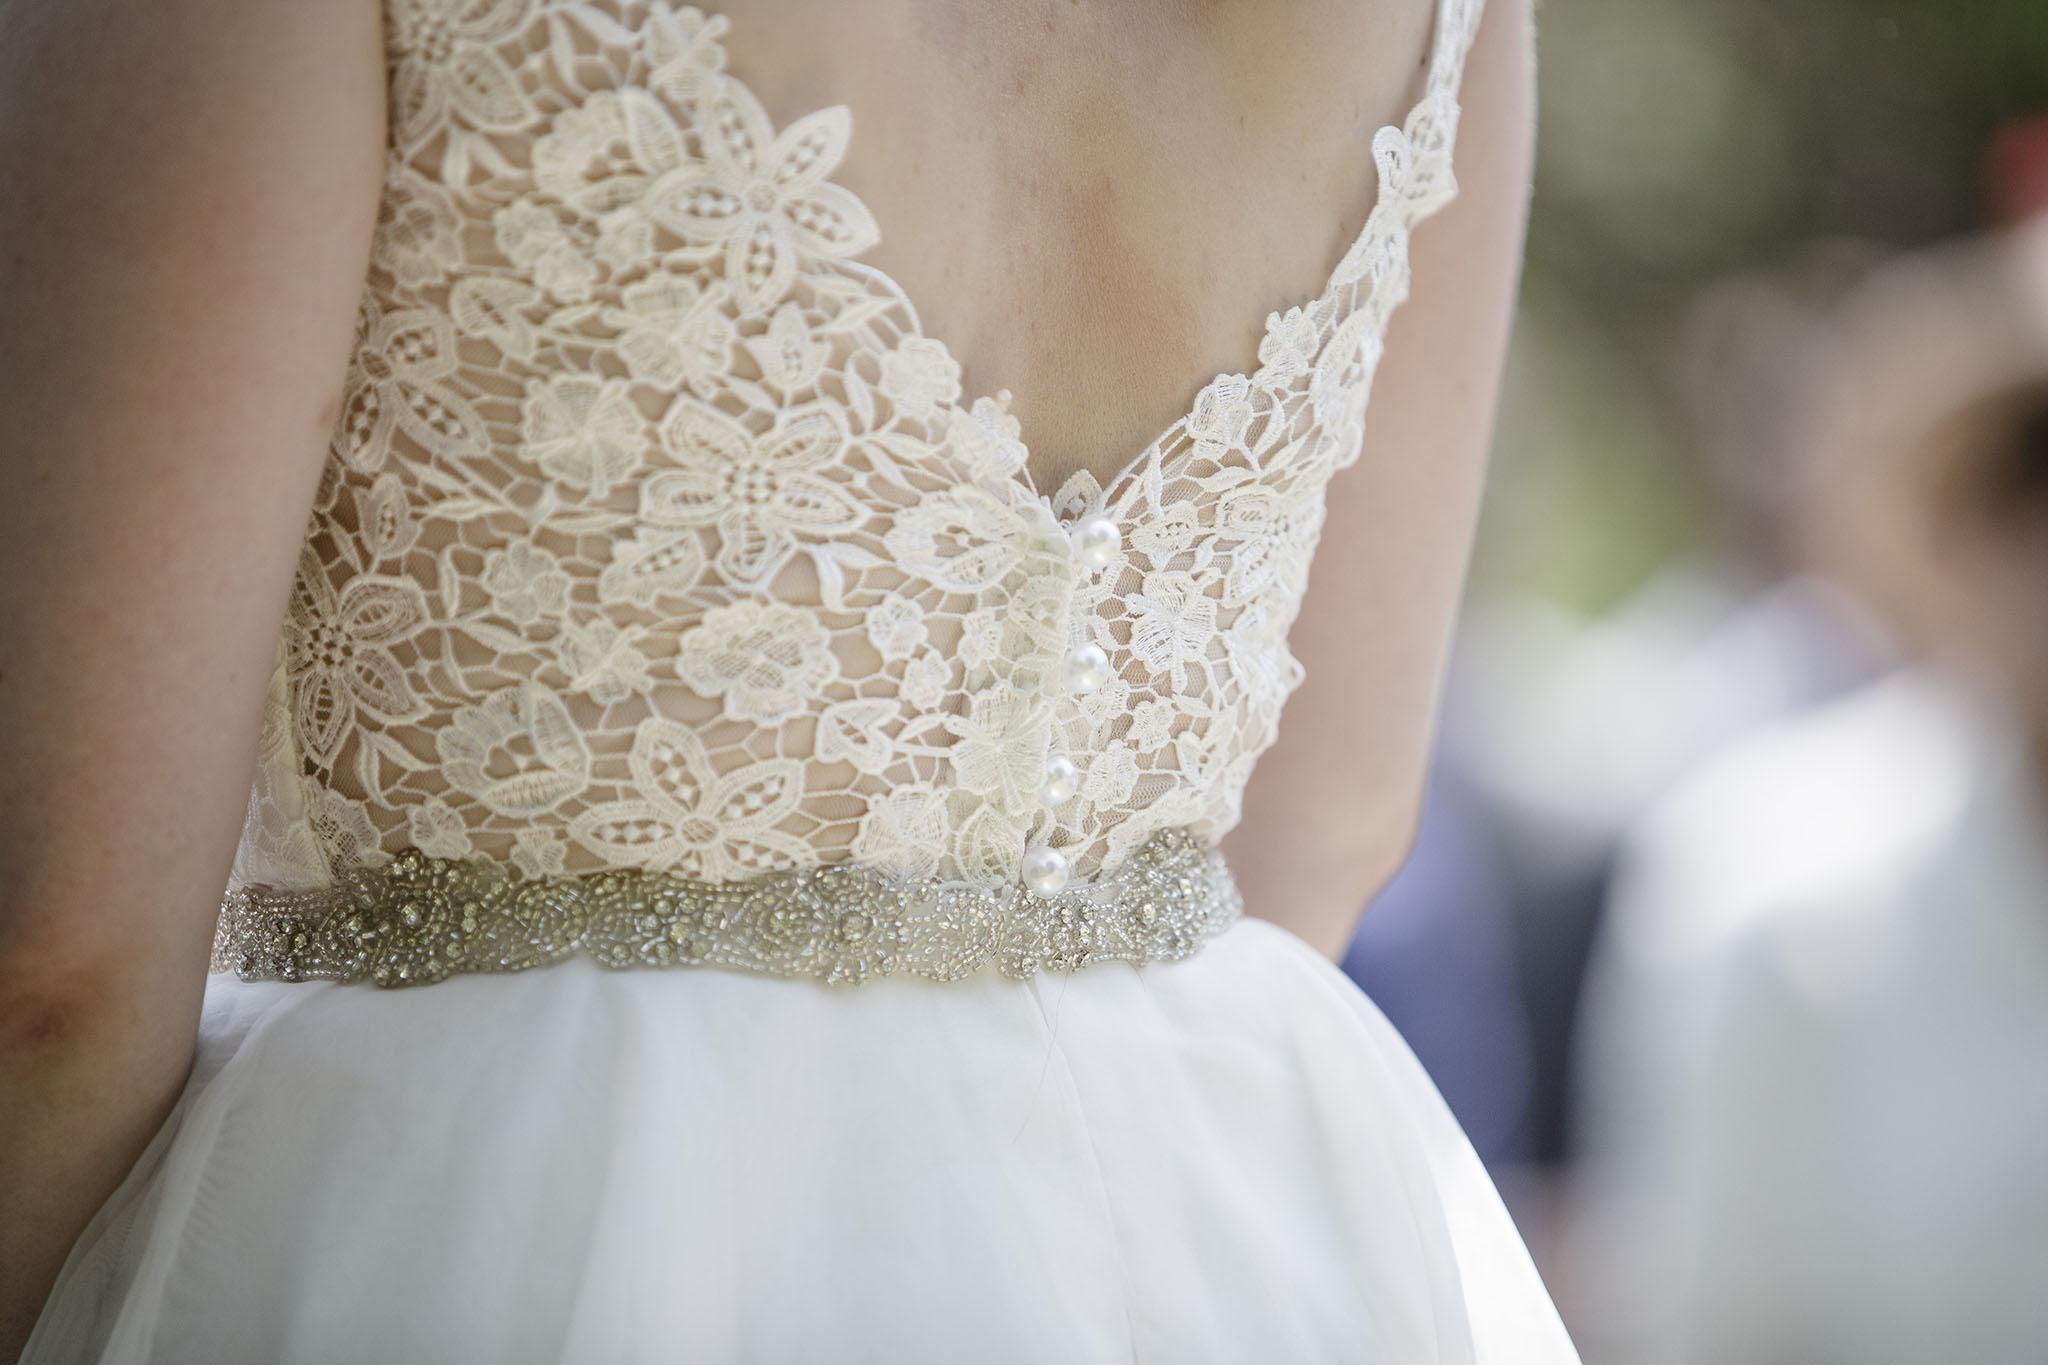 elizabethgphotography_kingslangley_hertfordshire_fineart_wedding_pottersbar_matt_katie_pegg_21.jpg